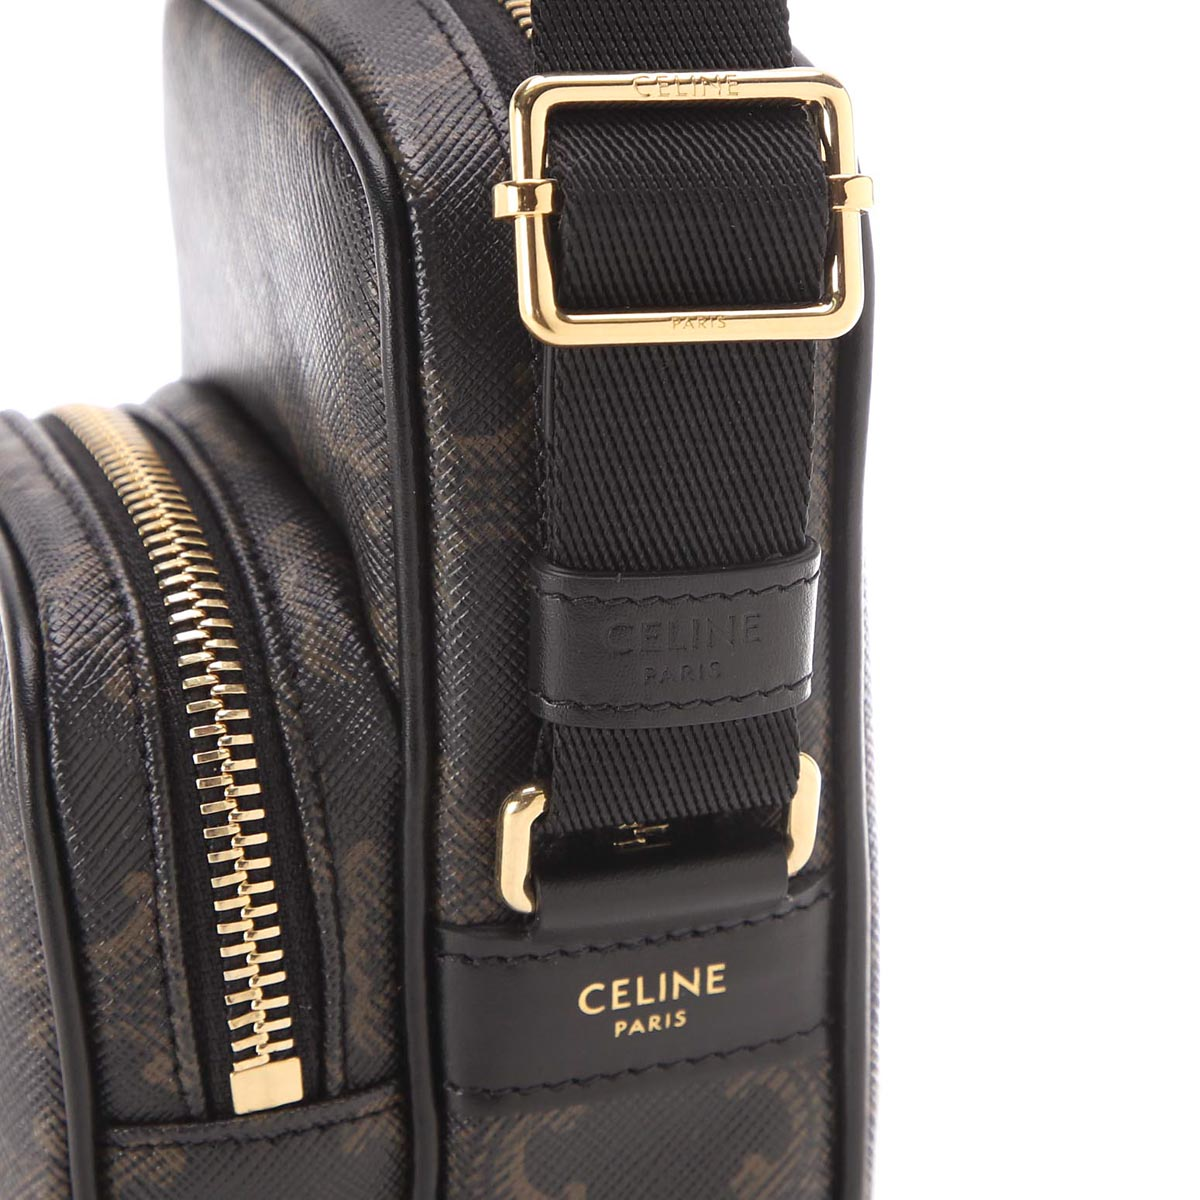 CELINE セリーヌ ショルダーバッグ/クロスボディバッグ メッセンジャーバッグ メンズ